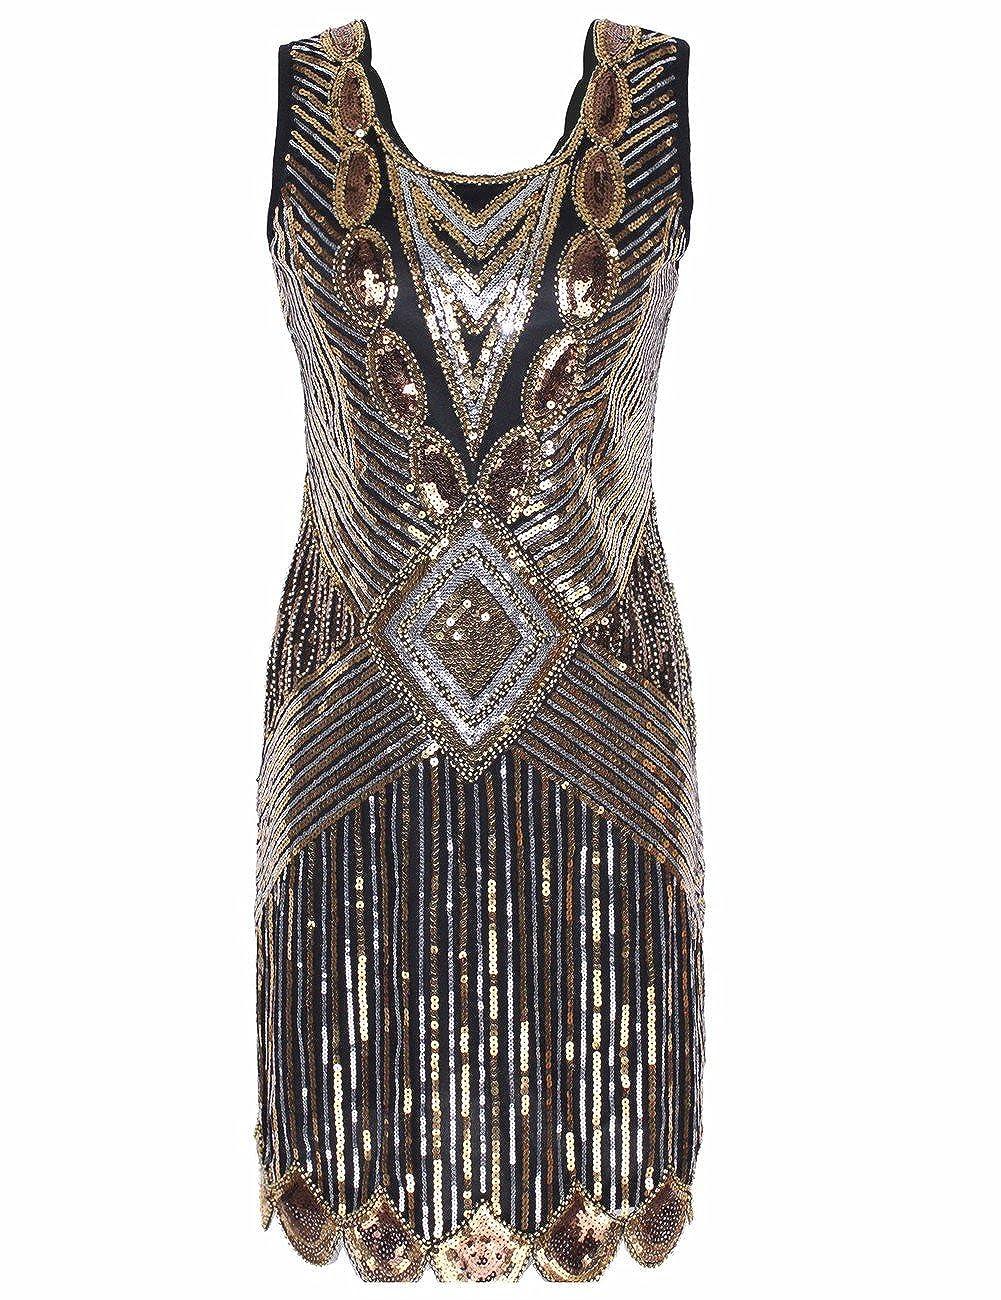 kayamiya Womens 1920S Sequined Beaded Back Deep V Gatsby Flapper Evening Dress